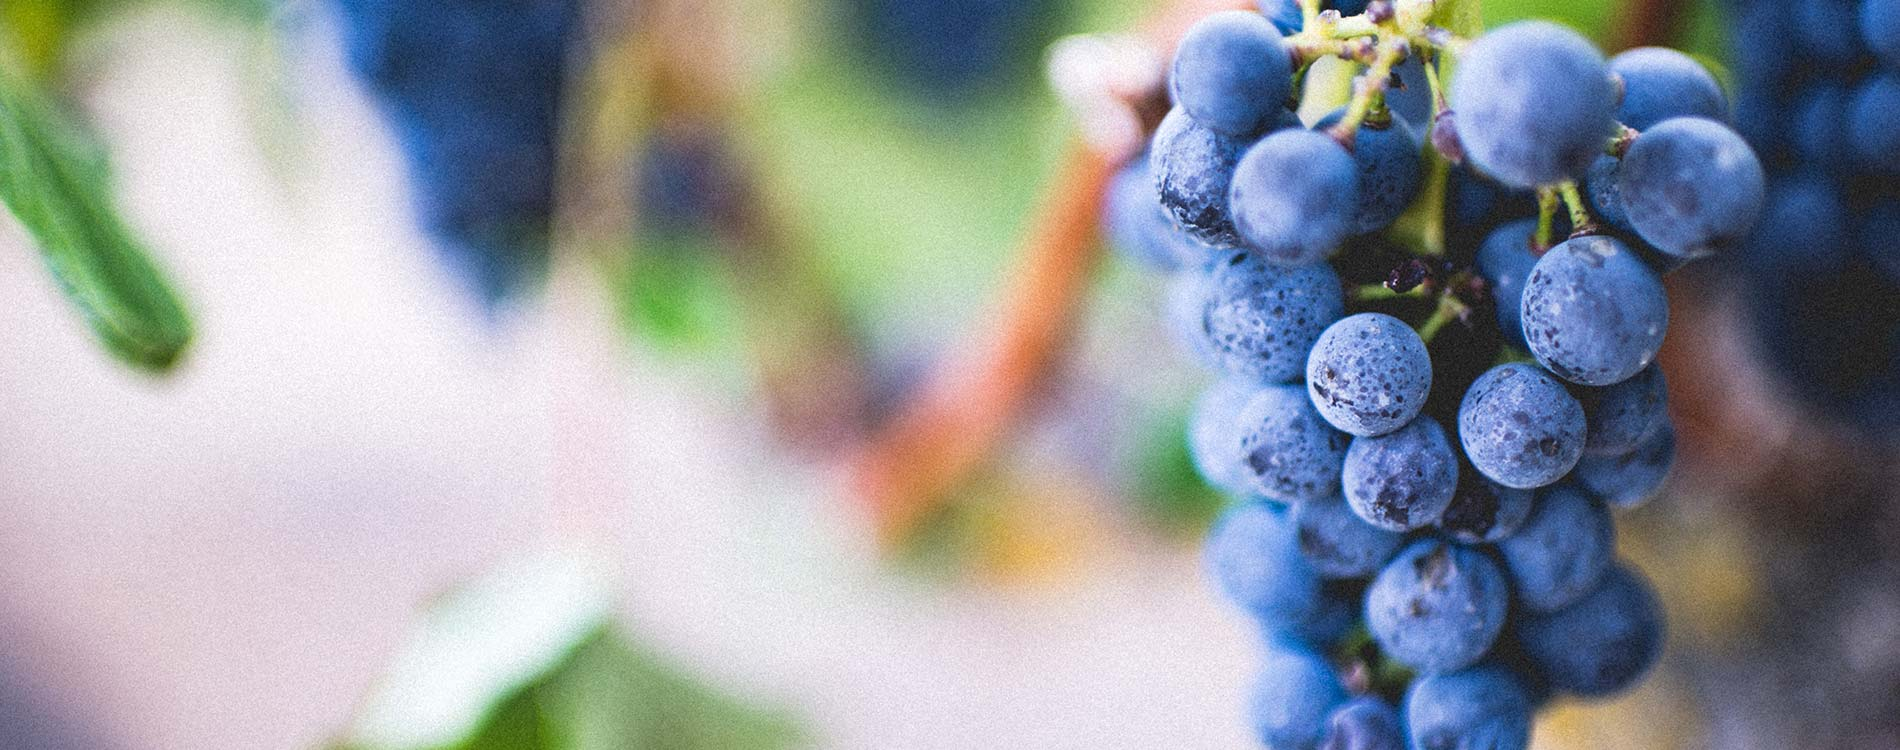 hotel and dinner deal - Niche Destinations 4-star-superior hotel GROSSARLER HOF wine grapes